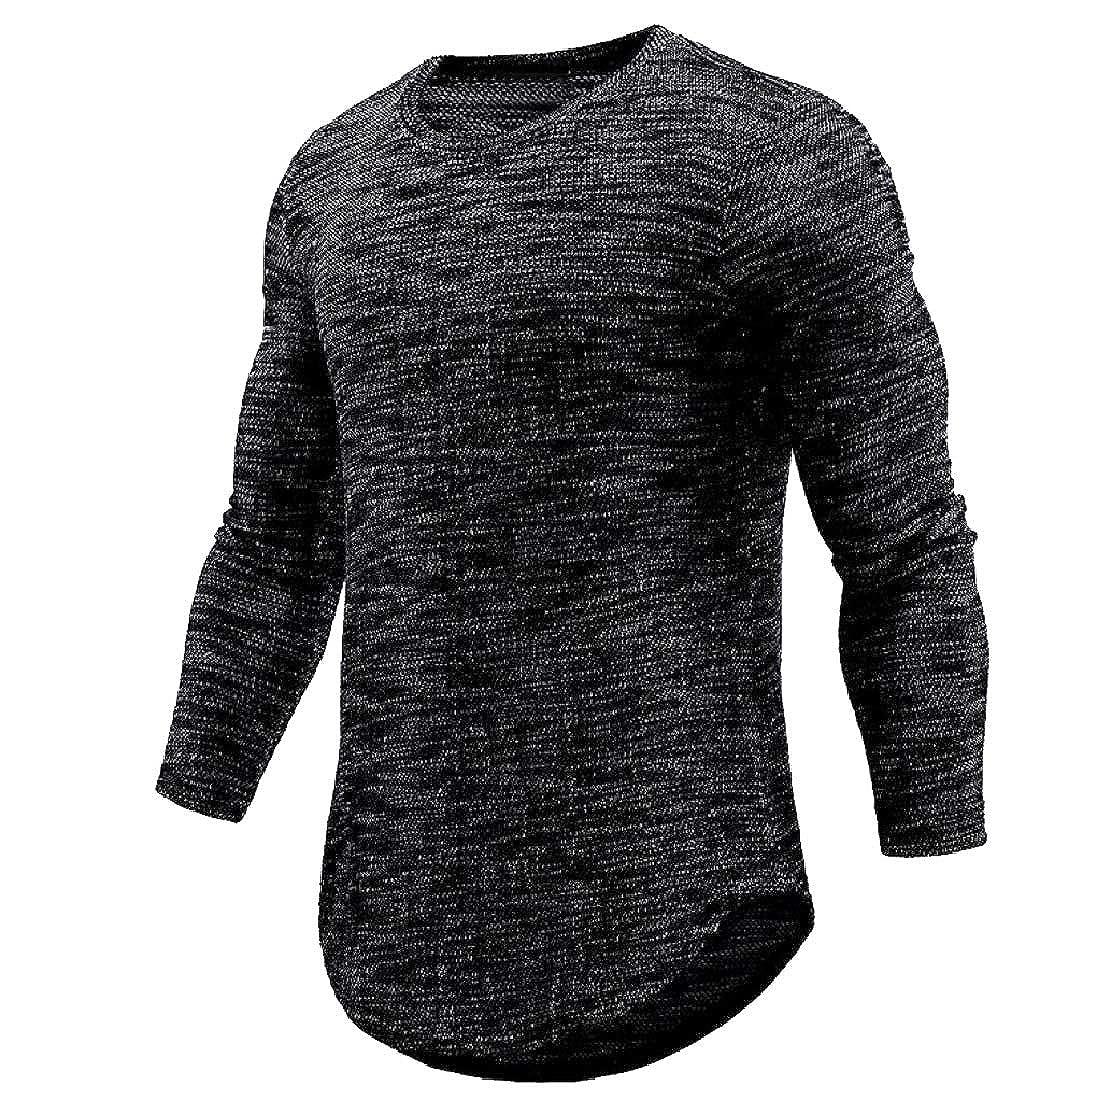 Men Trendy Crew-Neck Solid Color Plus Size Casual Tee Shirt